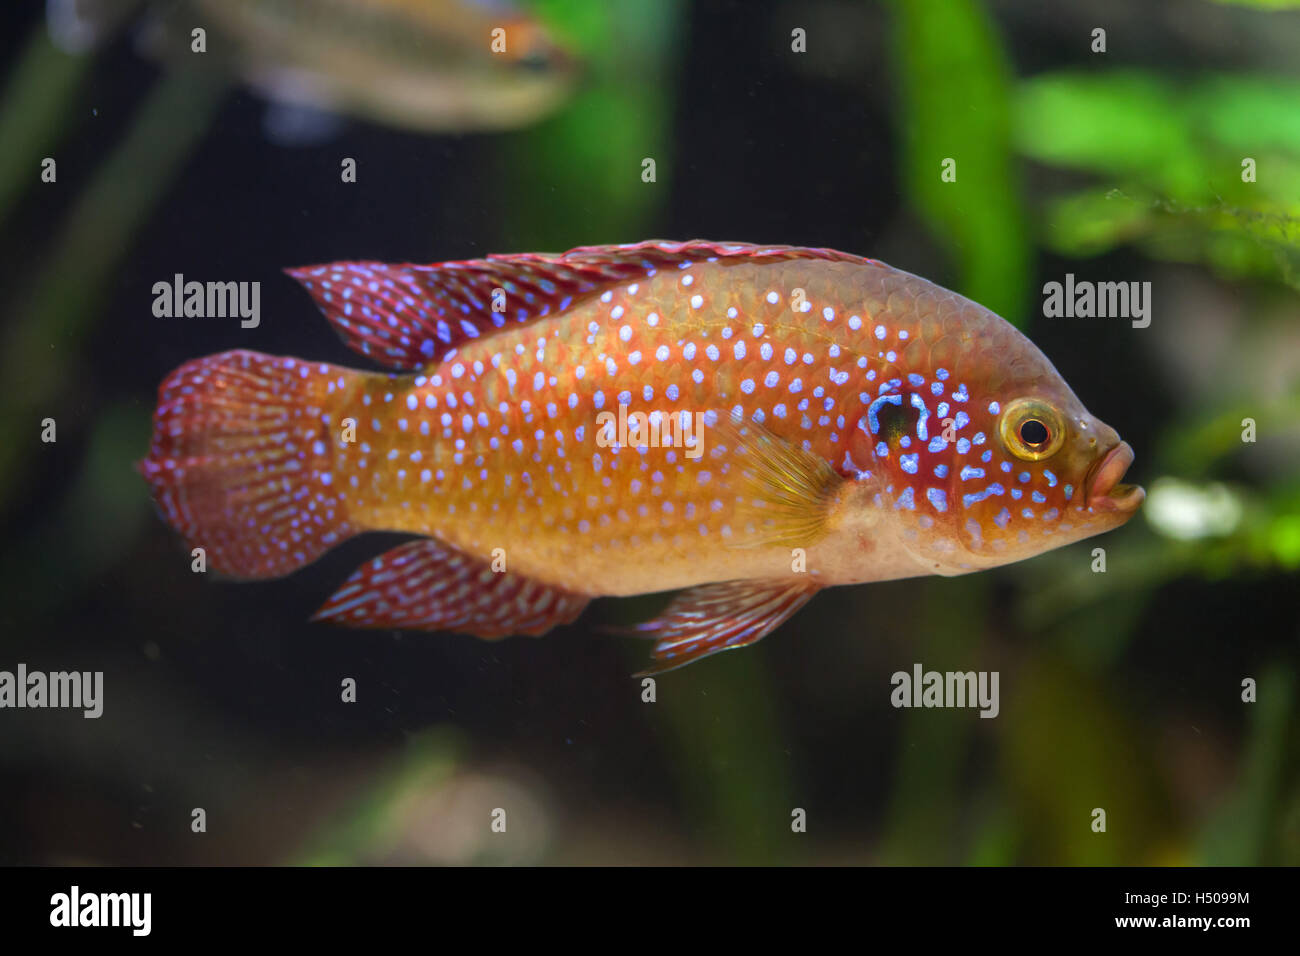 Freshwater jewel fish - African Jewelfish Hemichromis Bimaculatus Also Known As Jewel Cichlid Or Jewelfish Wildlife Animal